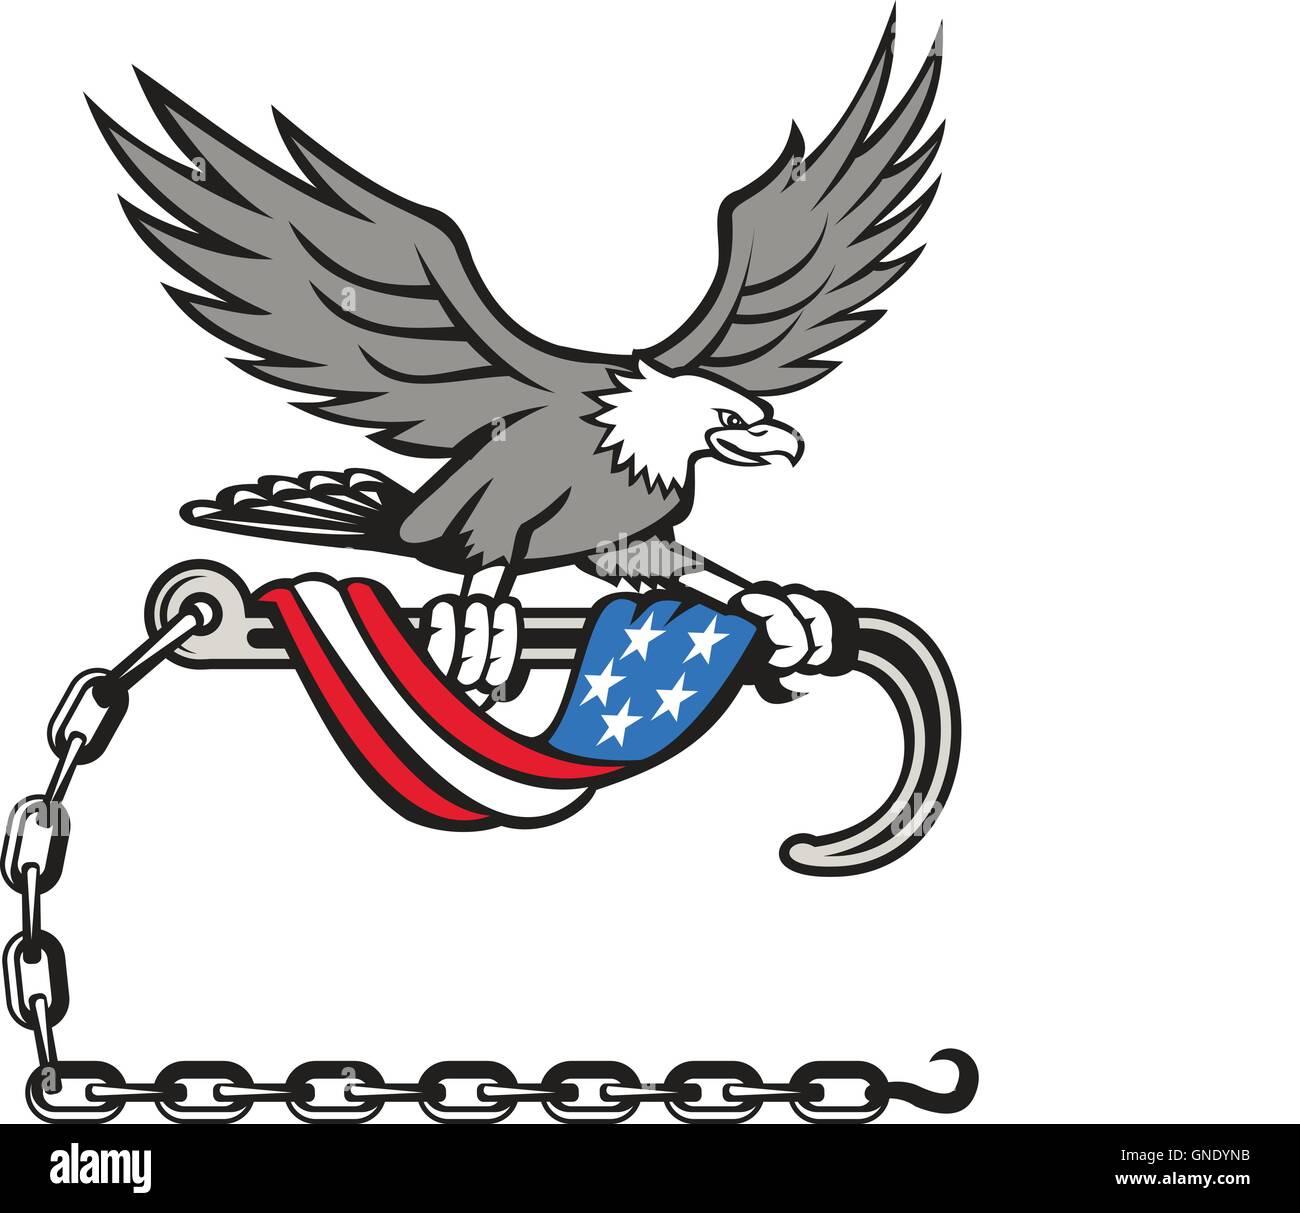 American Eagle Clutching Towing J Hook Flag Drape Retro - Stock Image